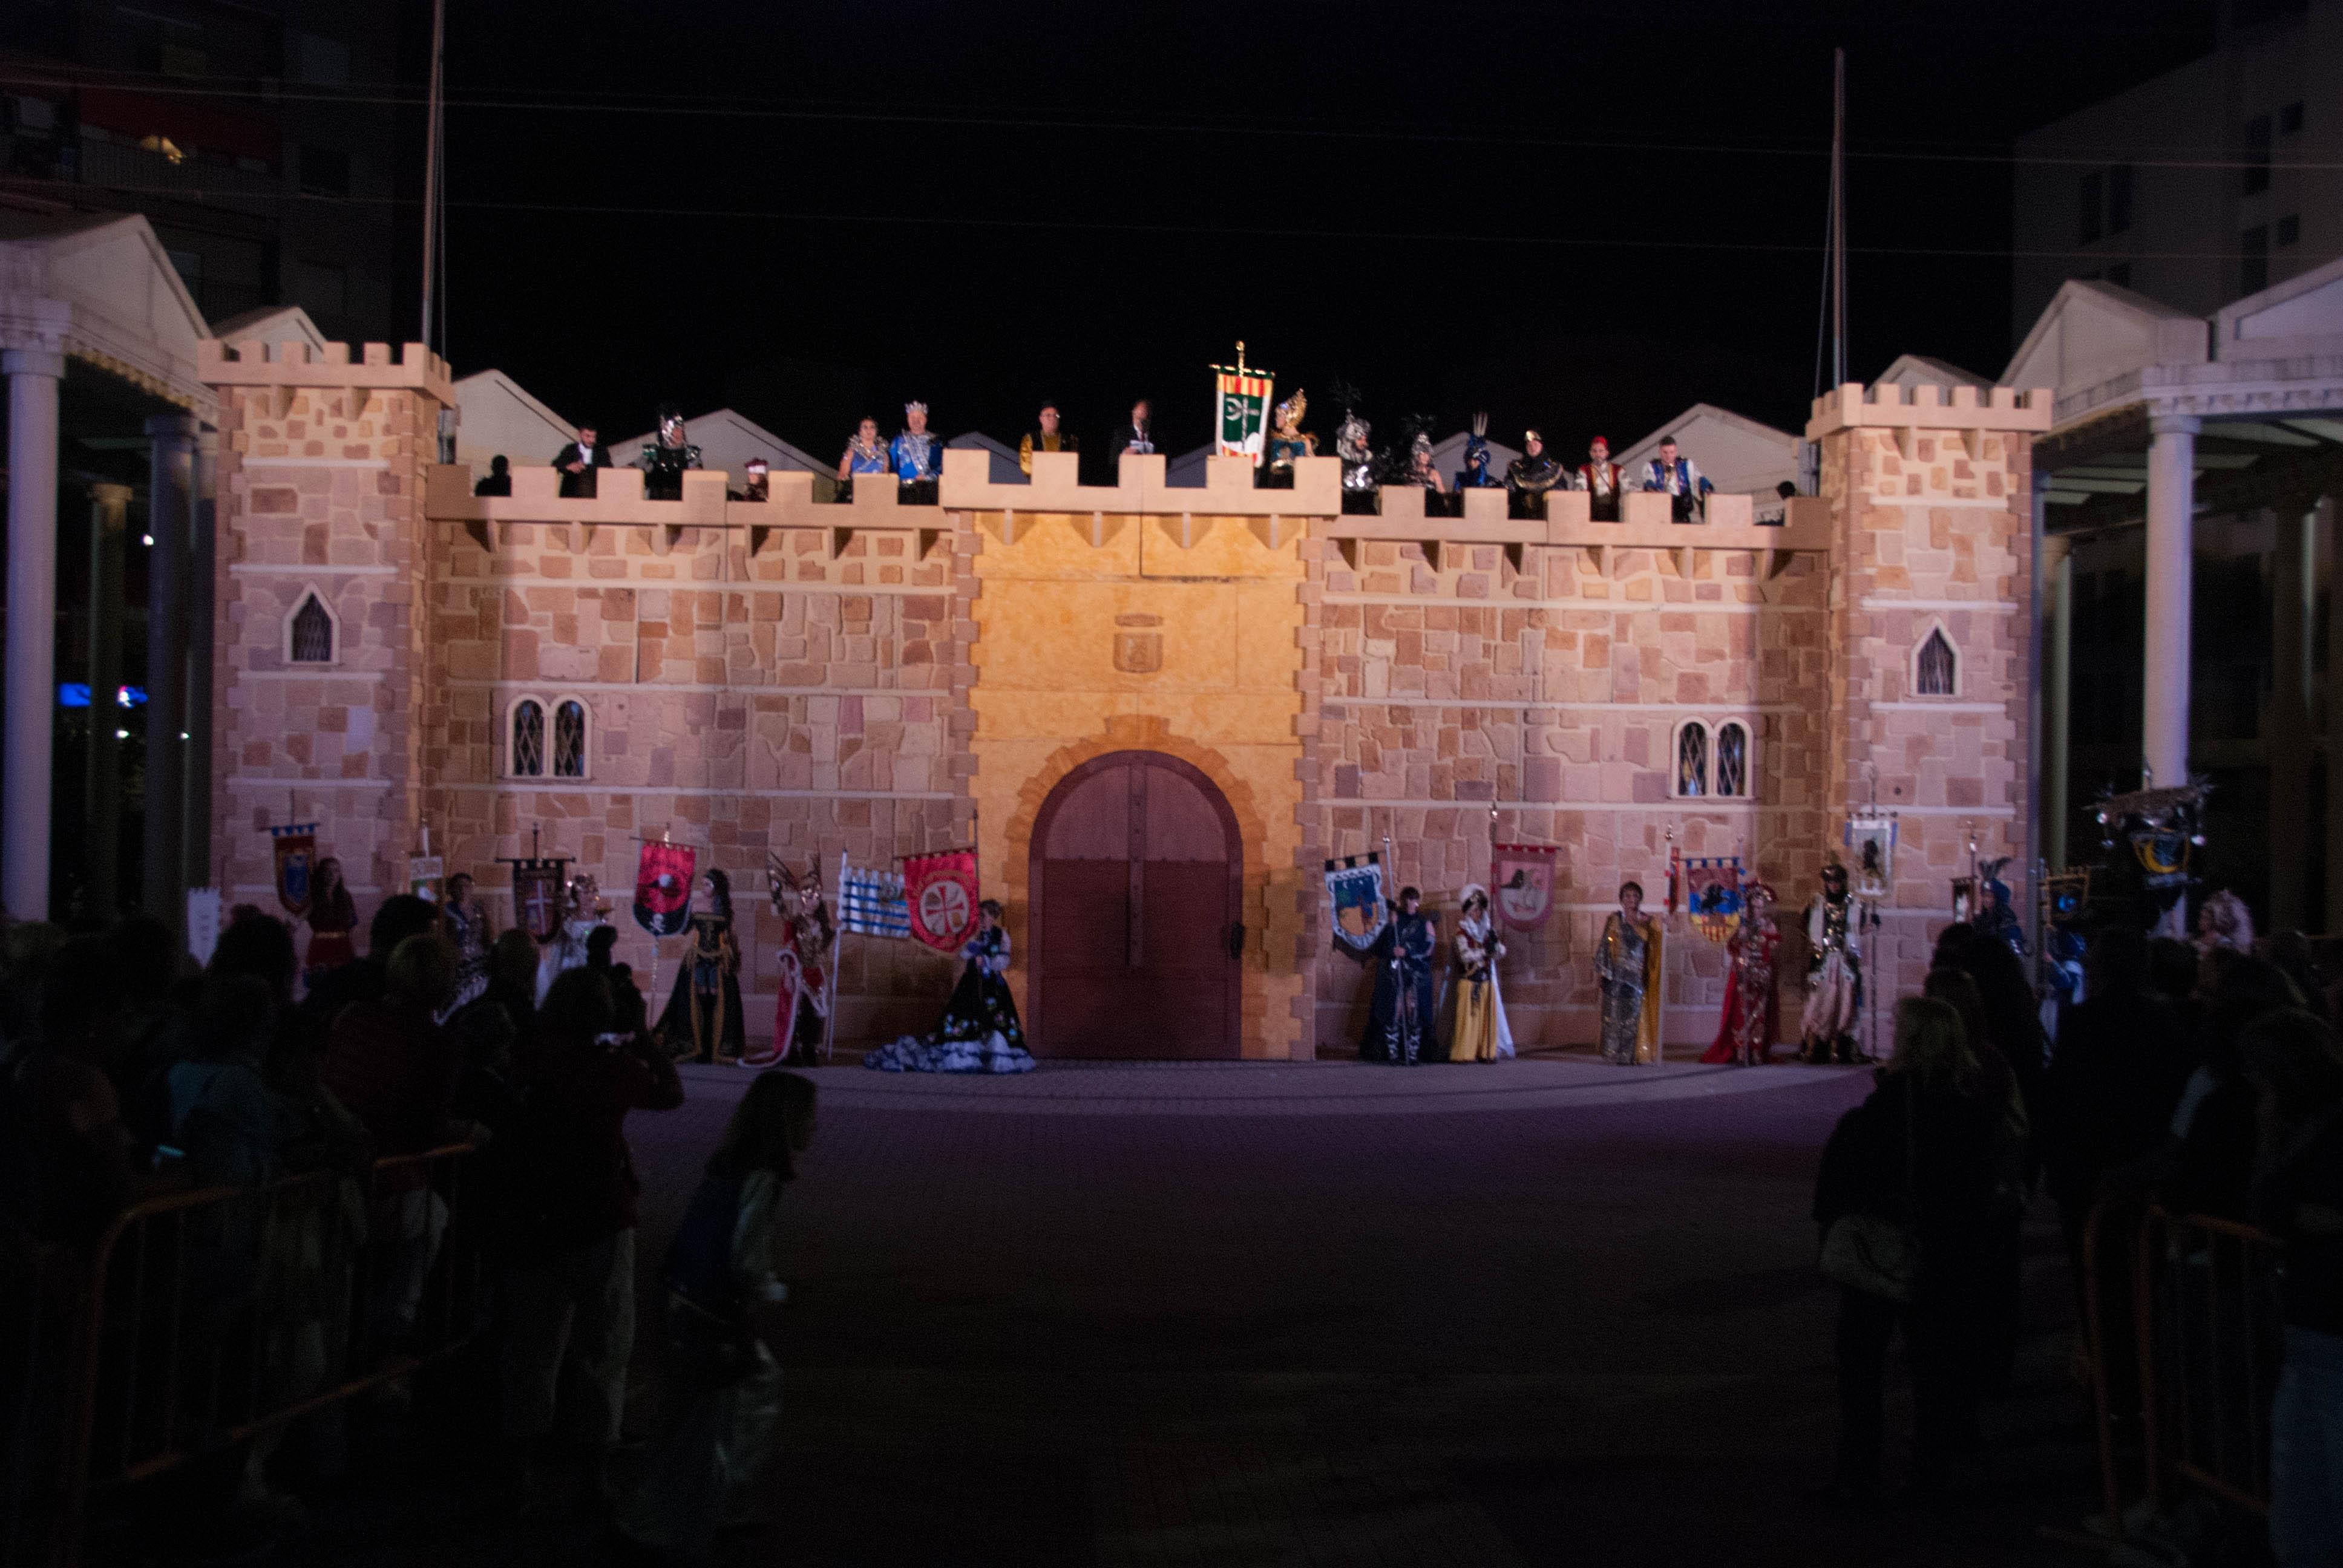 40 Aniversario – Fiestas de Moros y Cristianos 2017 de Calpe, Mario Schumacher Blog